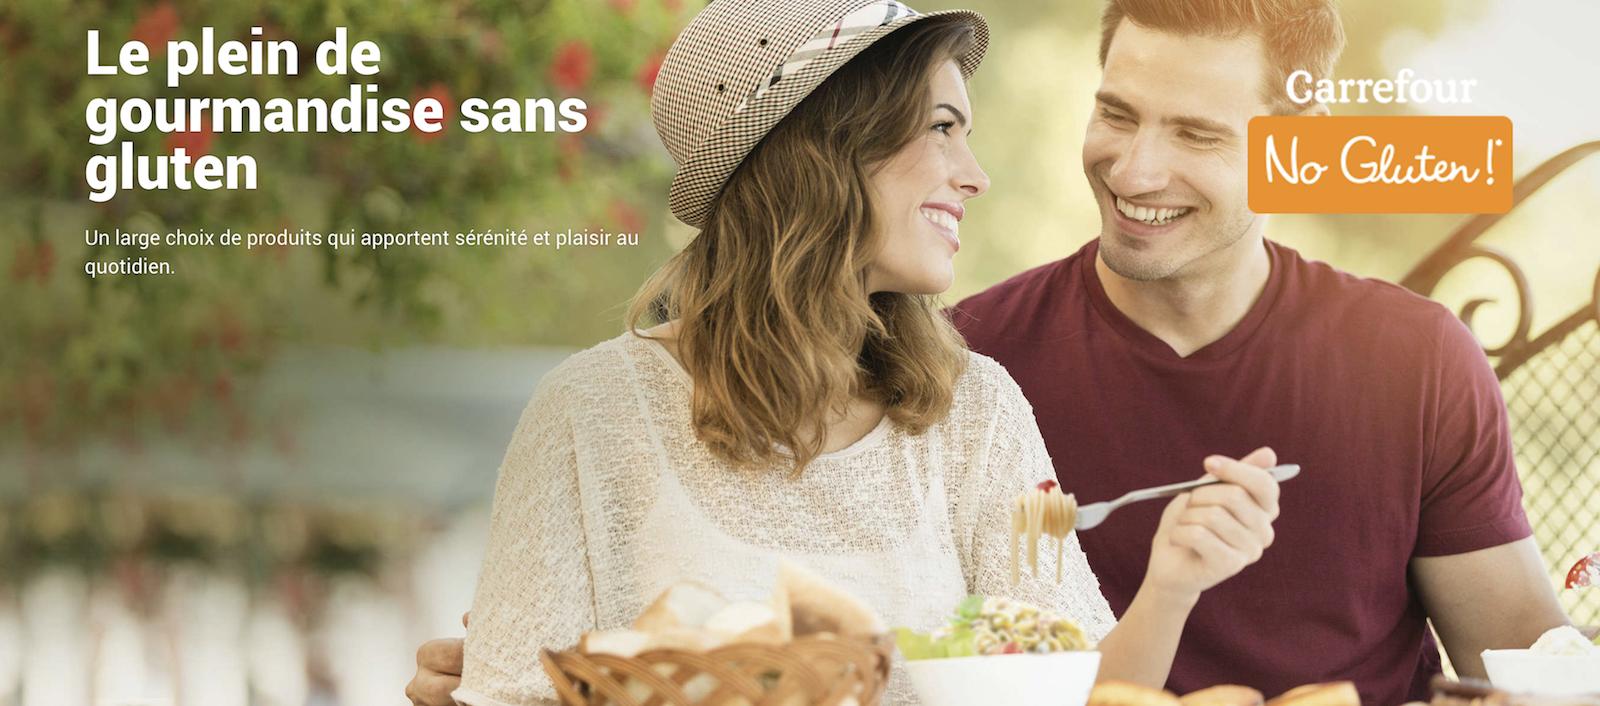 Carrefour sans gluten